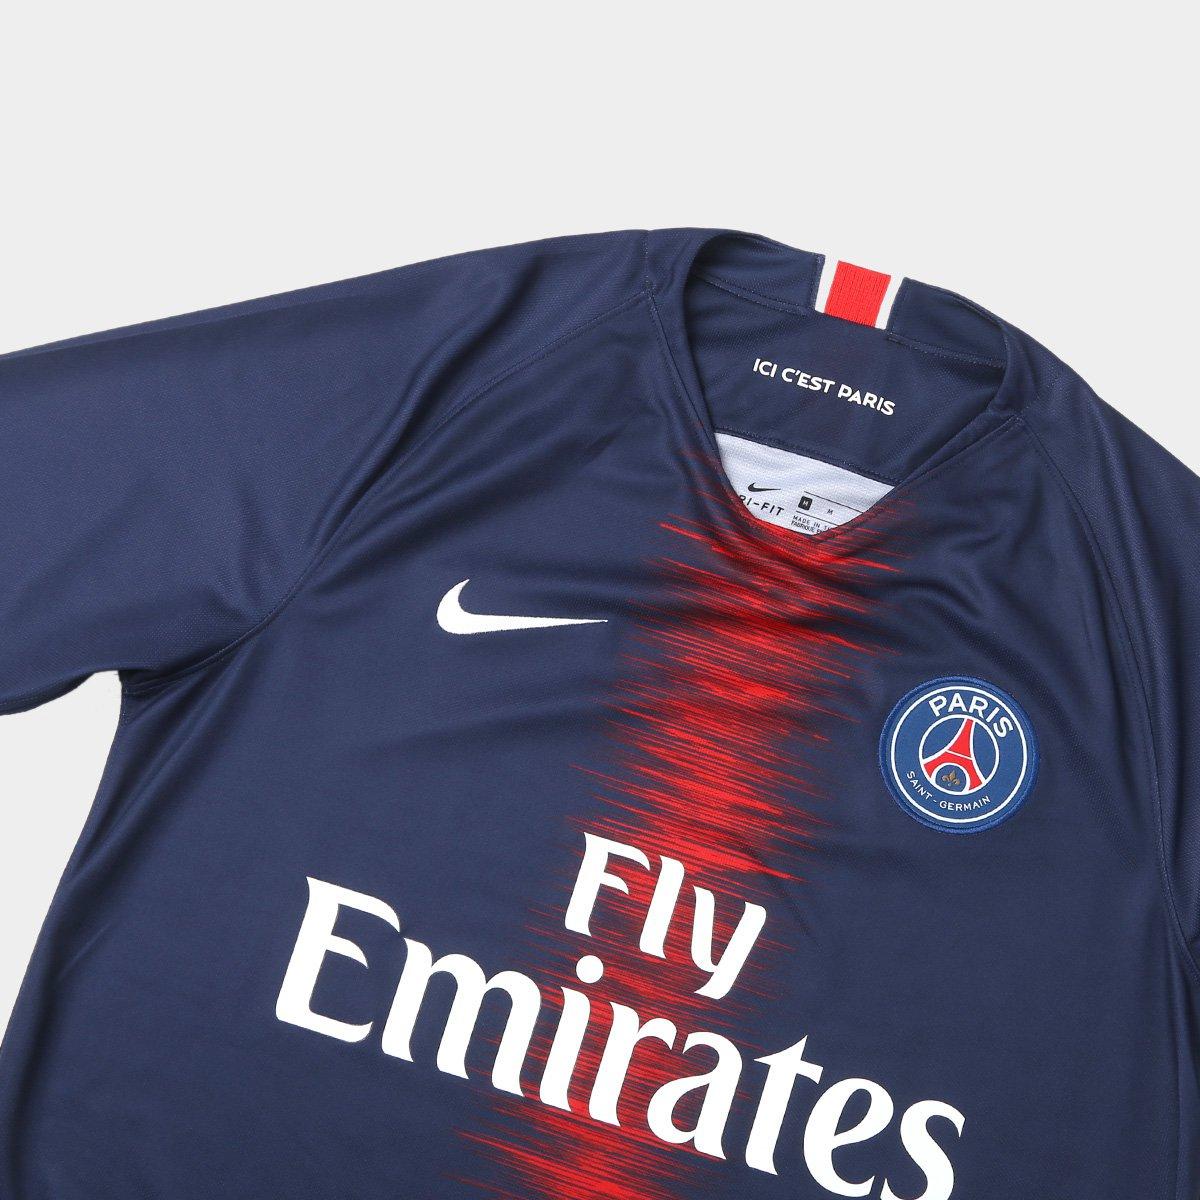 Camisa Paris Saint-Germain Home 18 19 s n° Torcedor Nike Masculina ... 7ce8636ed0c28